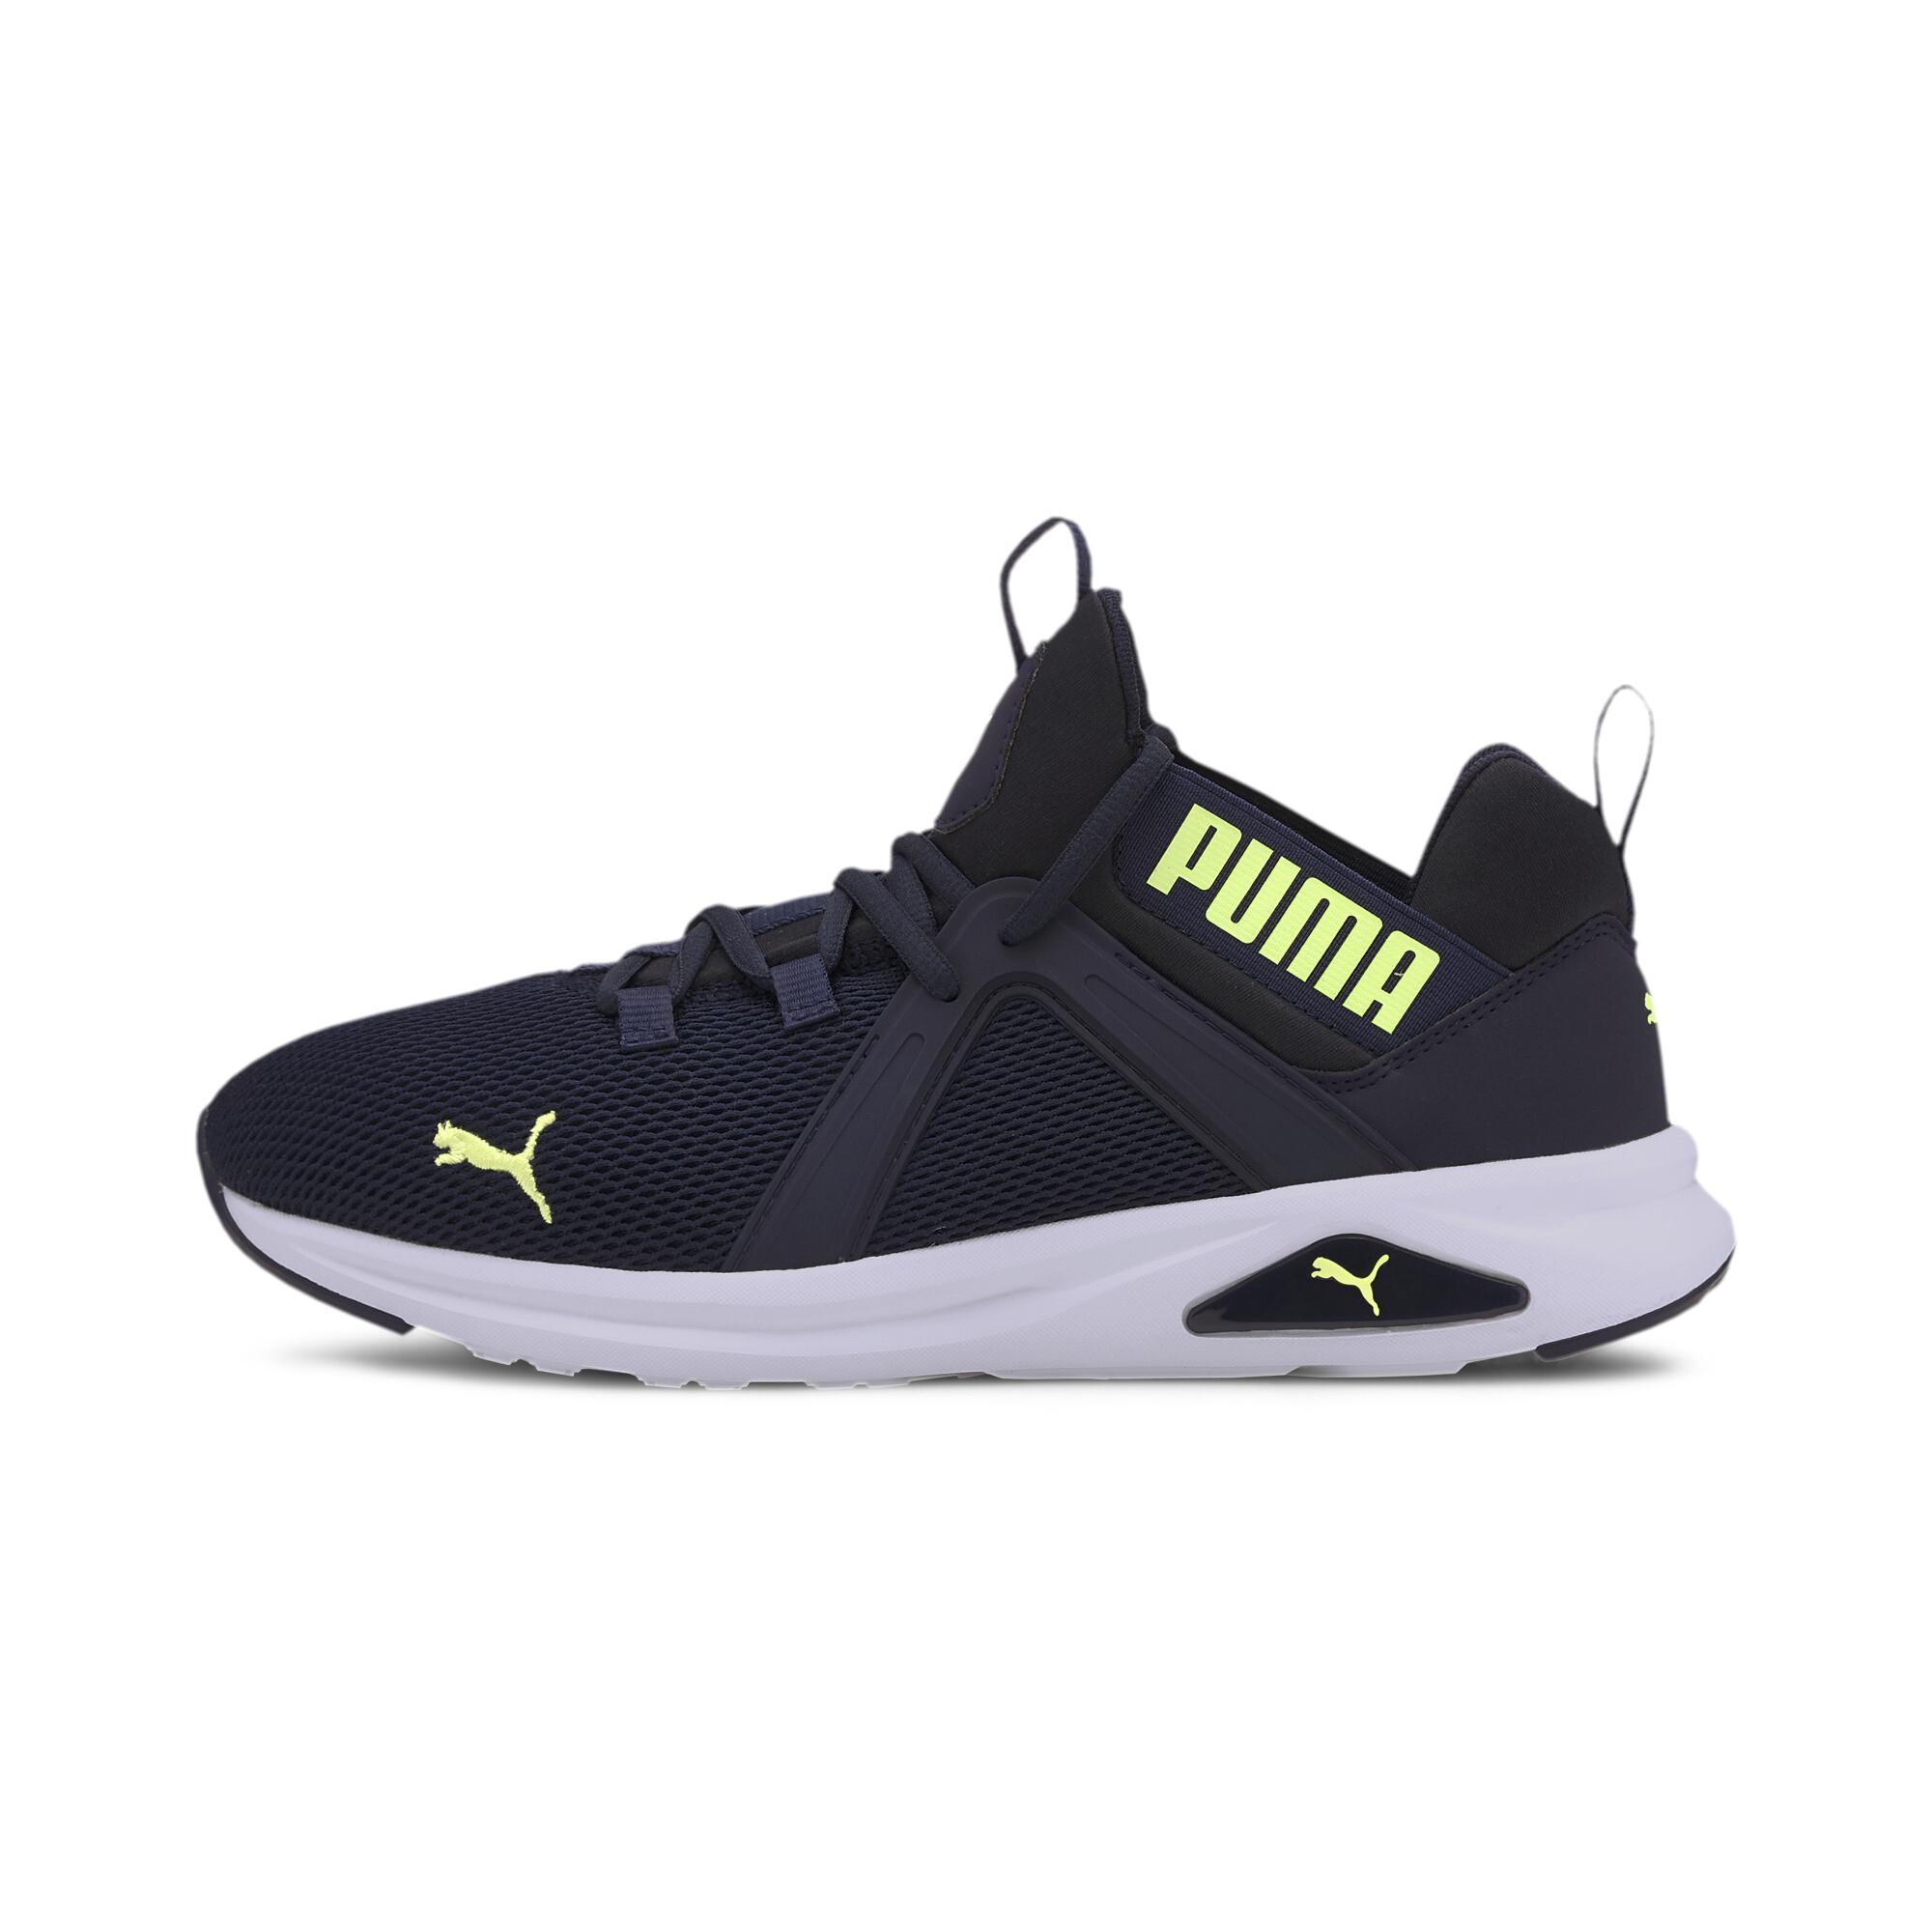 PUMA-Men-039-s-Enzo-2-Wide-Training-Shoes thumbnail 11